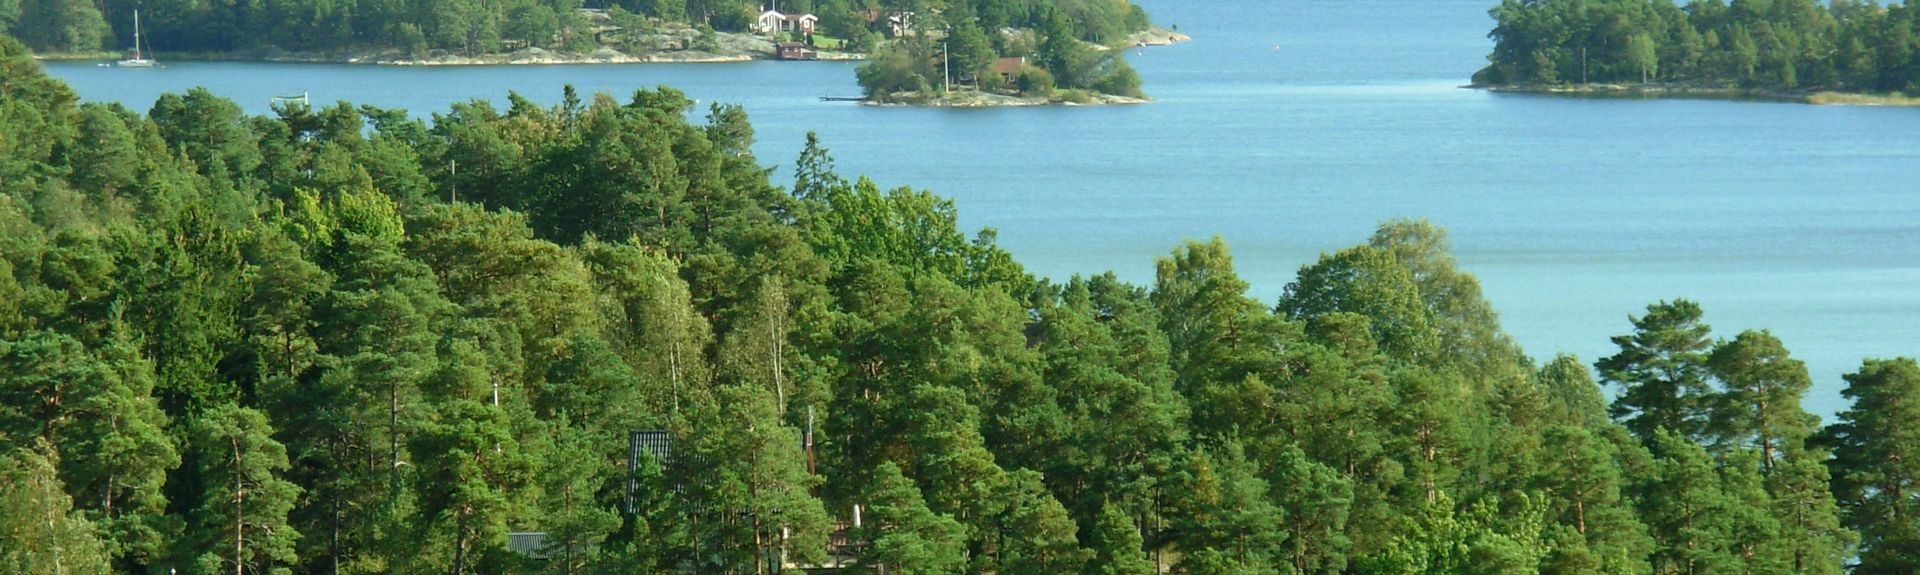 Nyköping Ö, Sweden